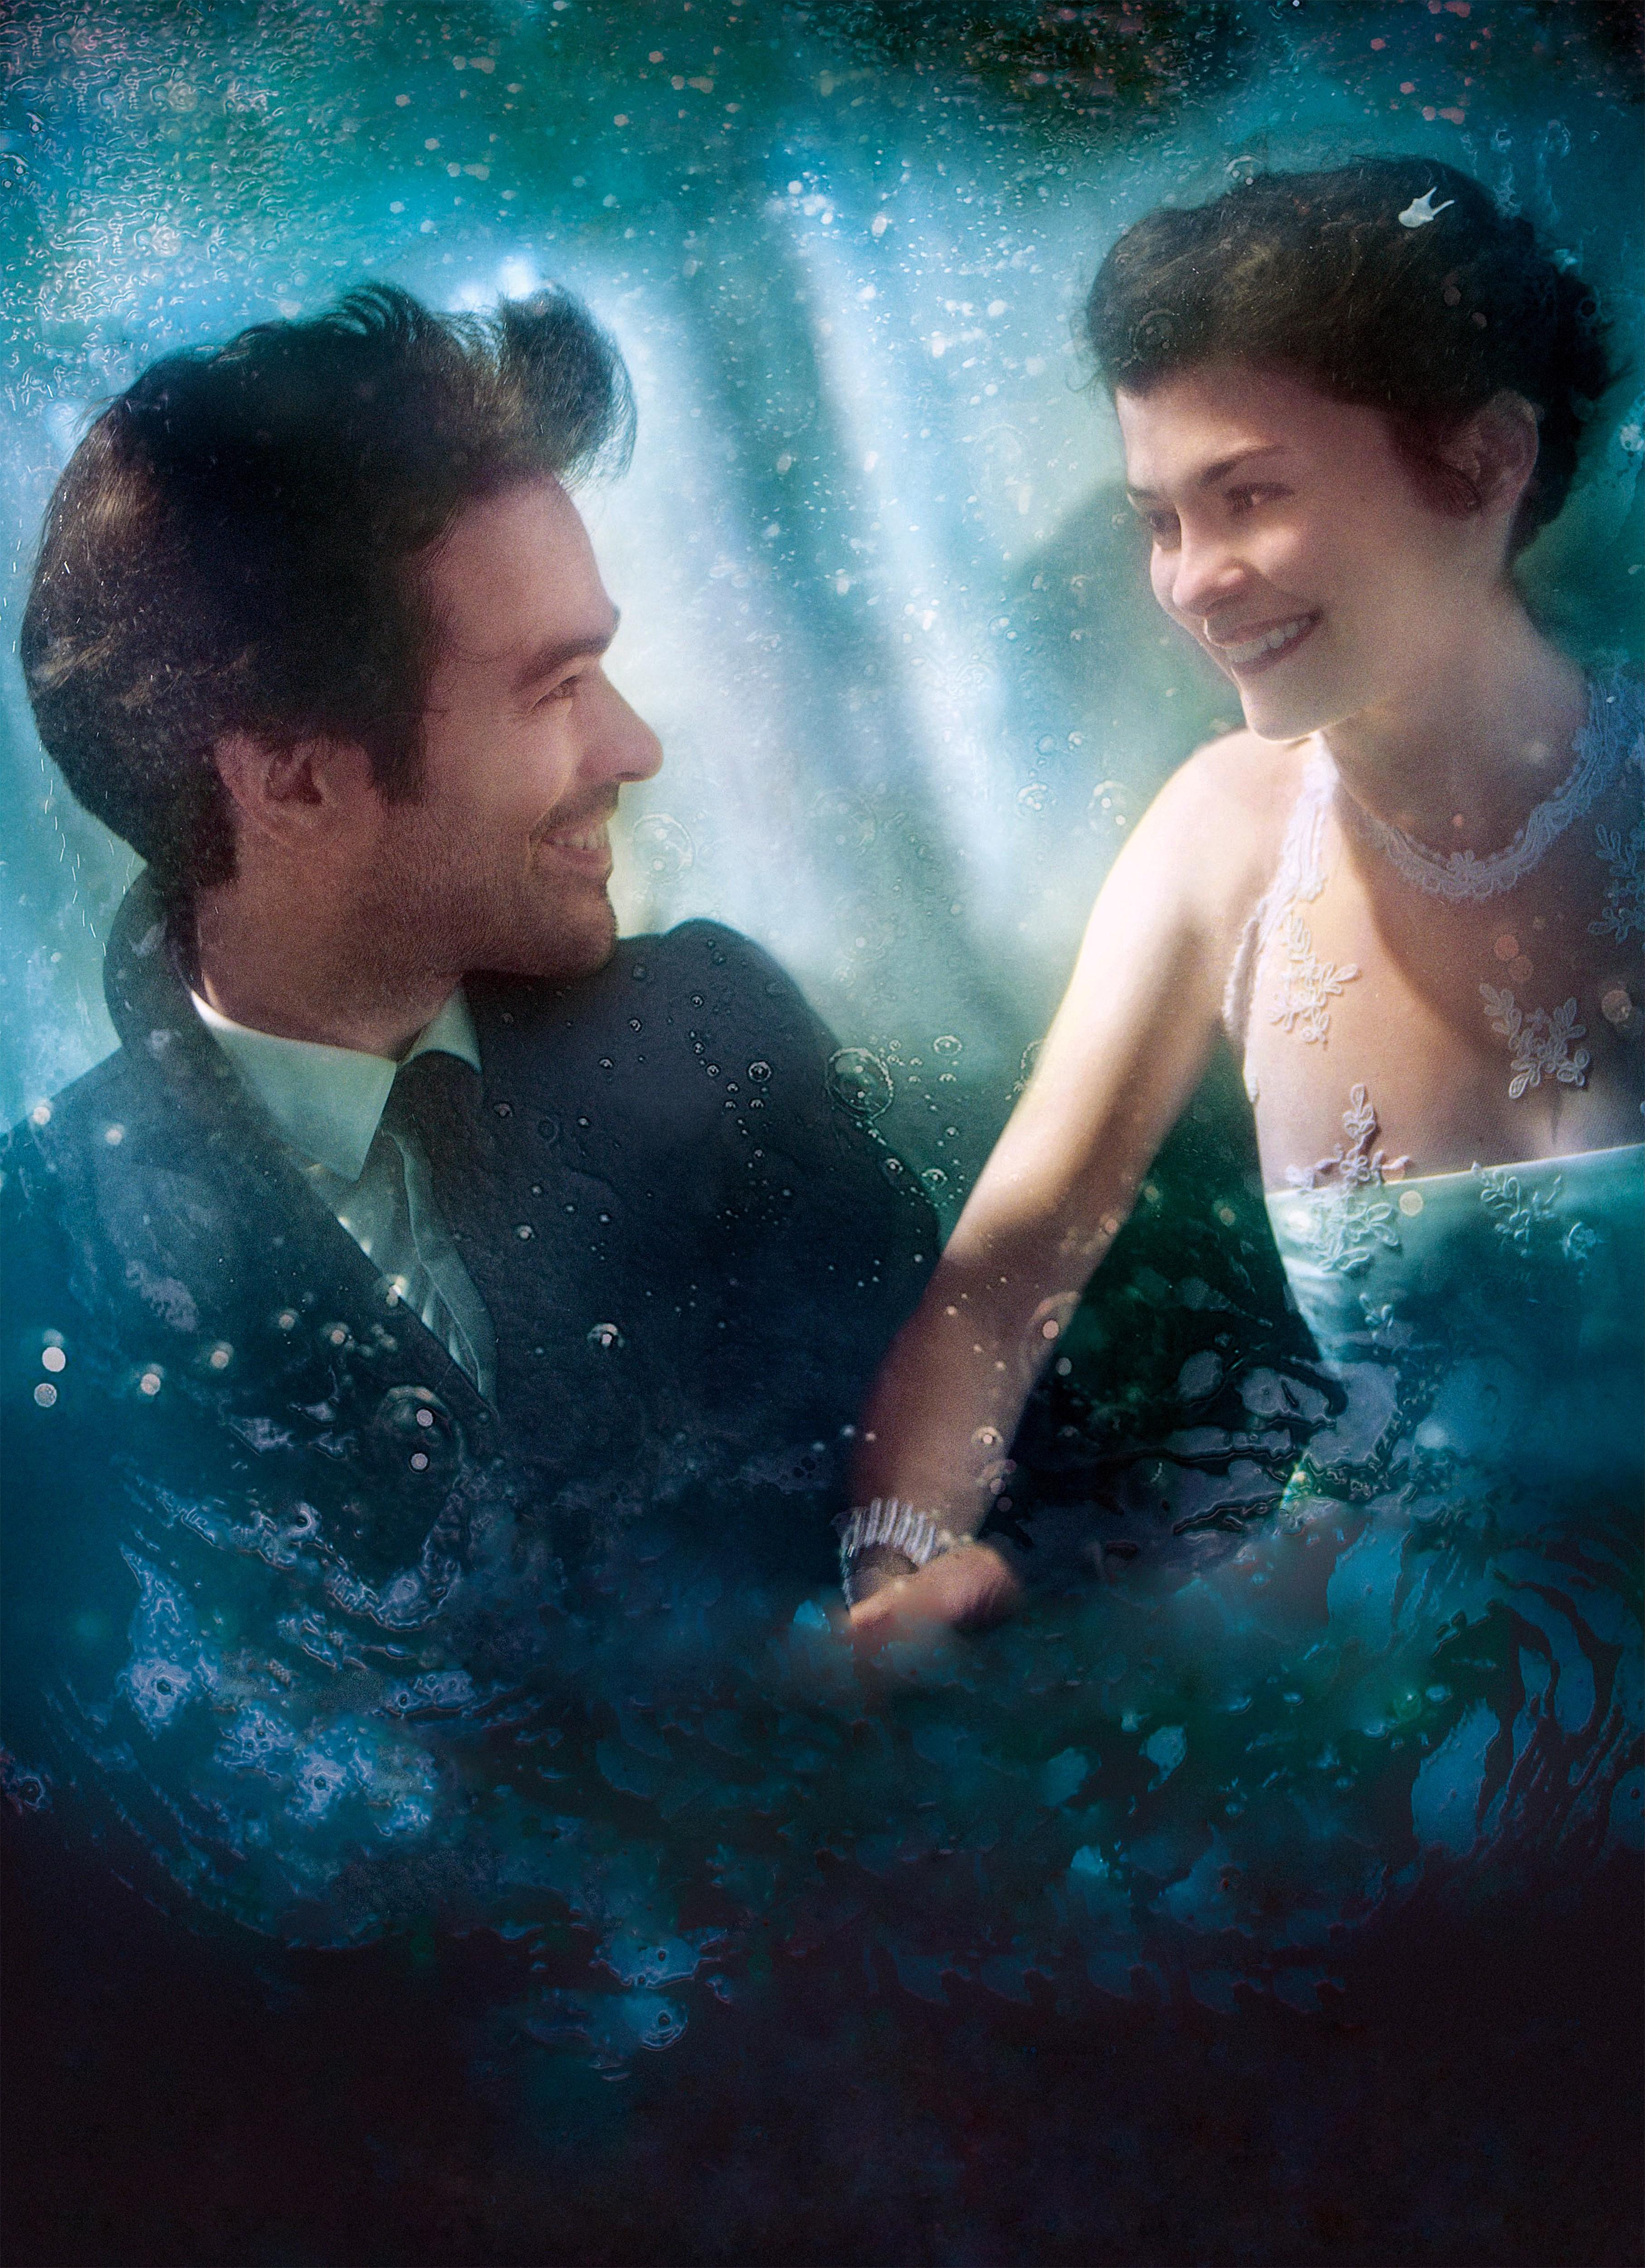 плакат фильма постер textless Пена дней